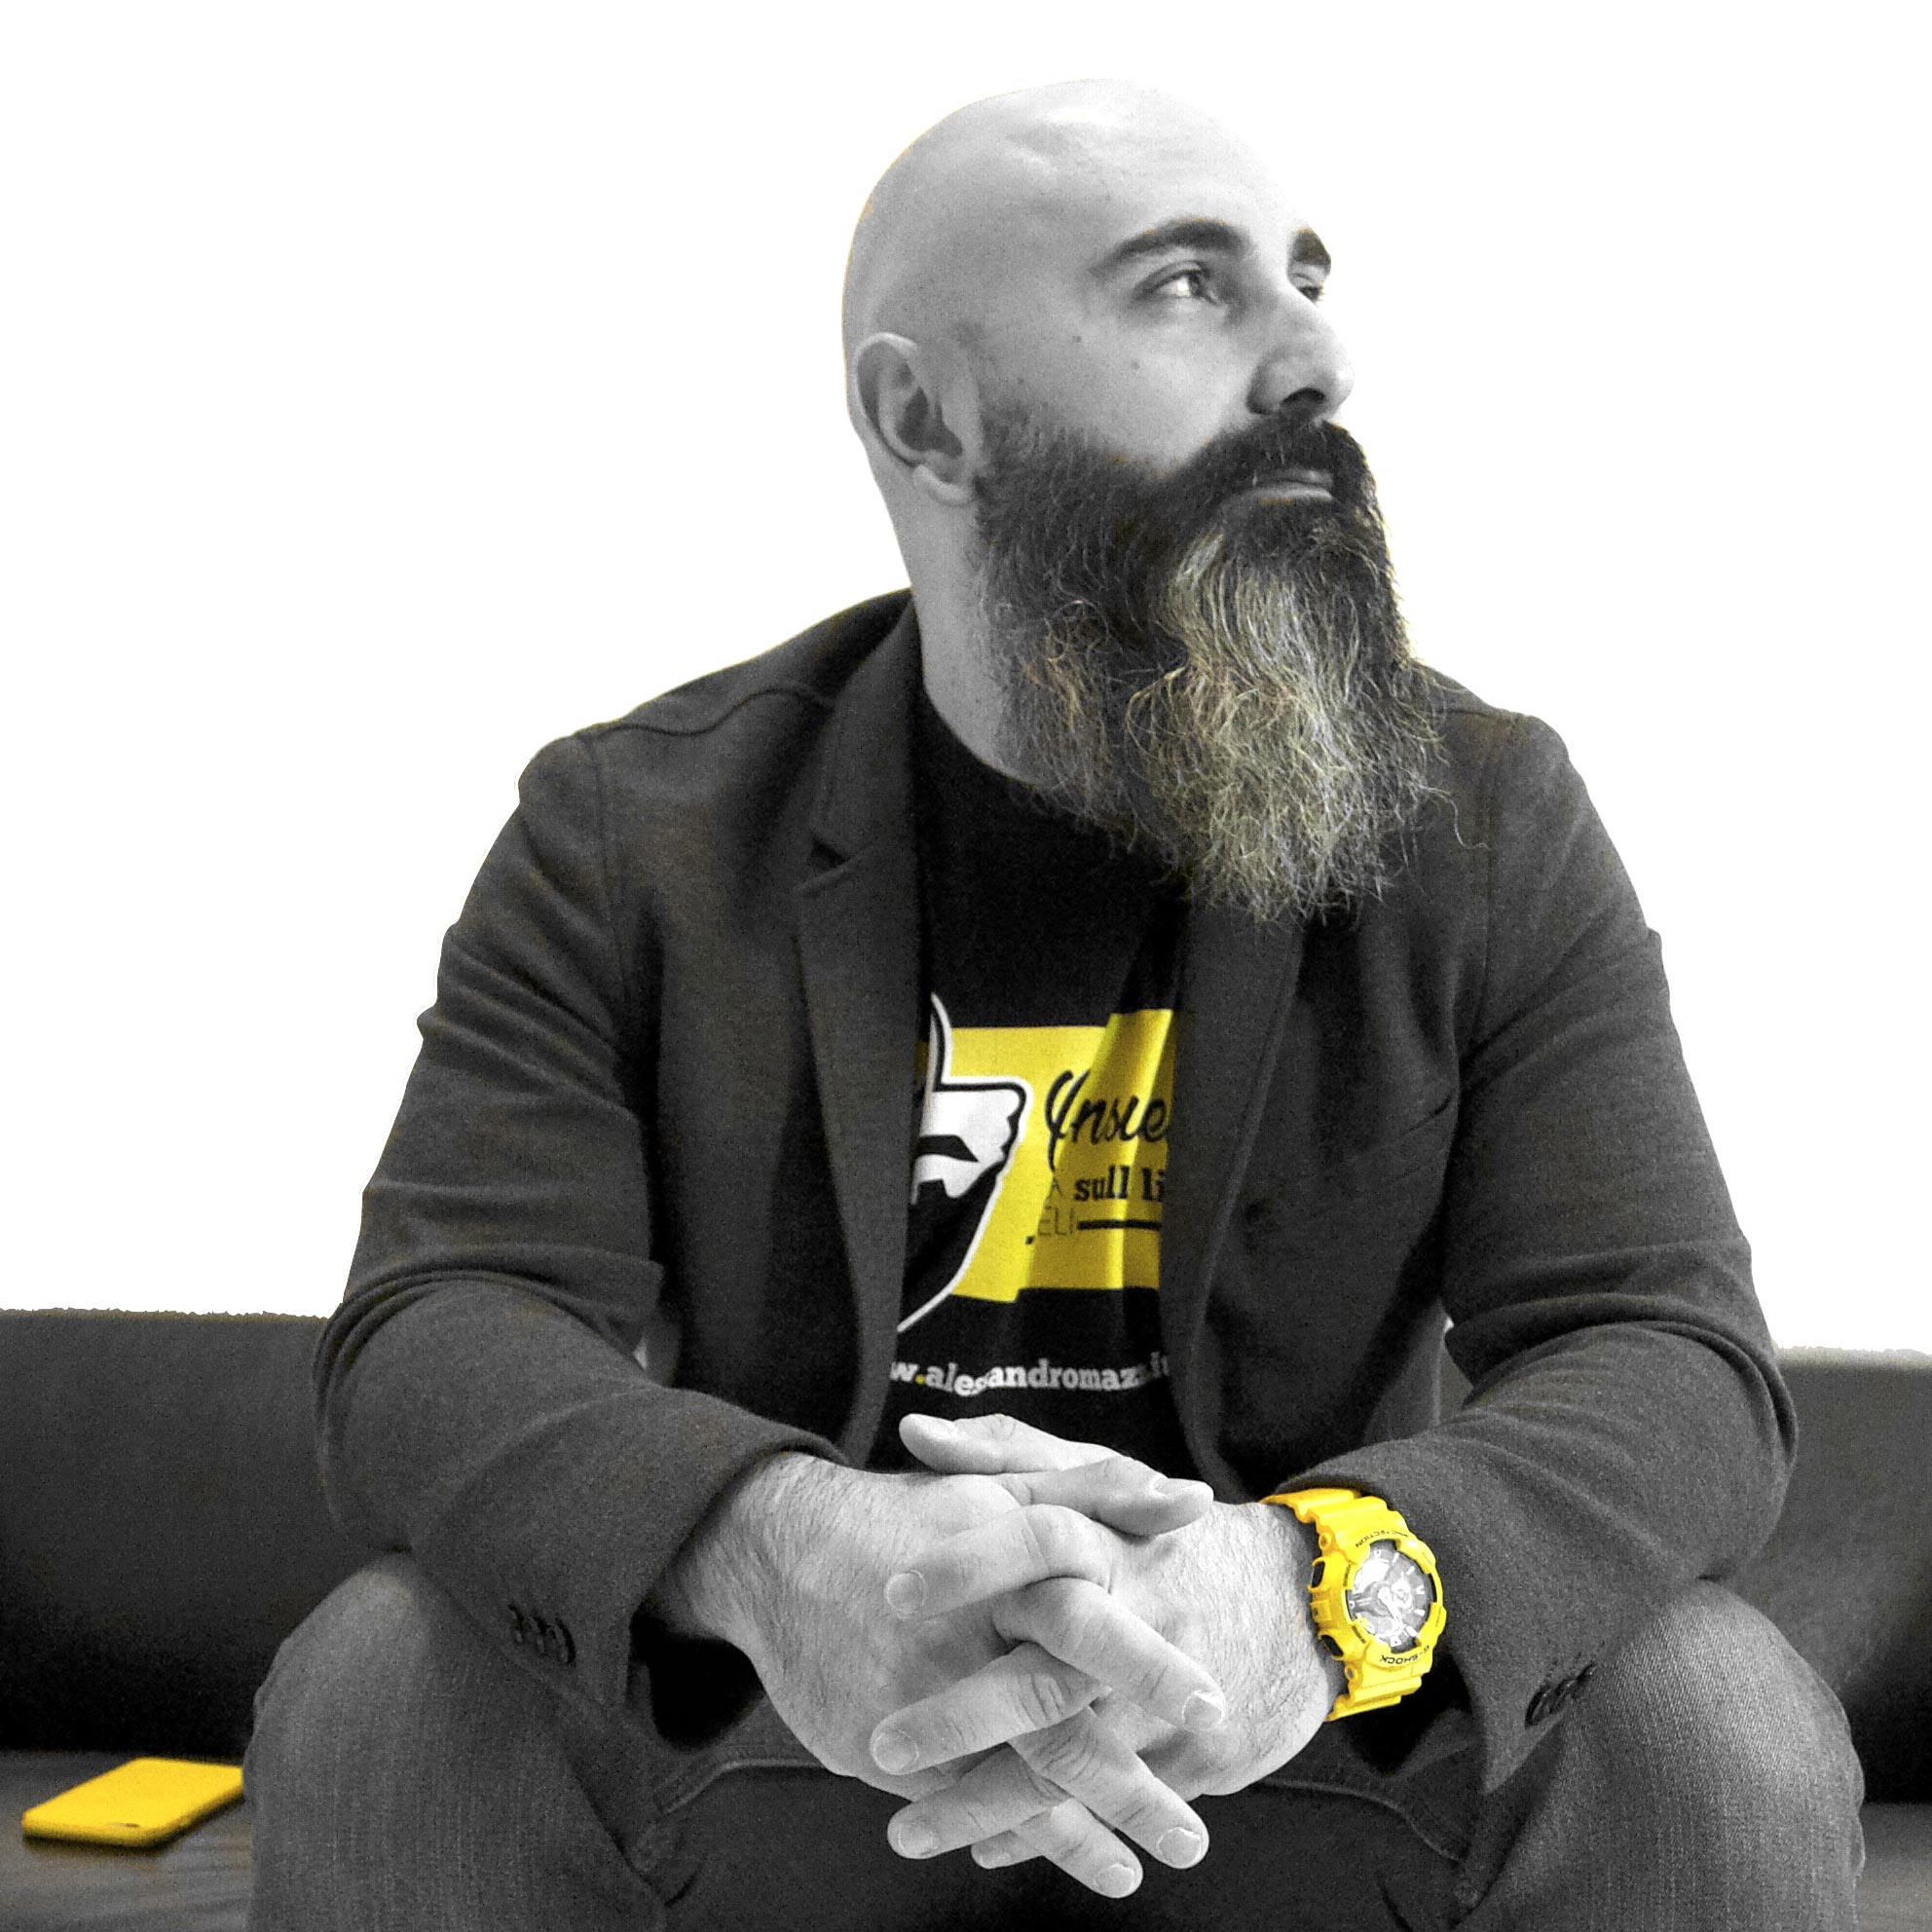 Alessandro Mazzù Digital Mindset a Firenze